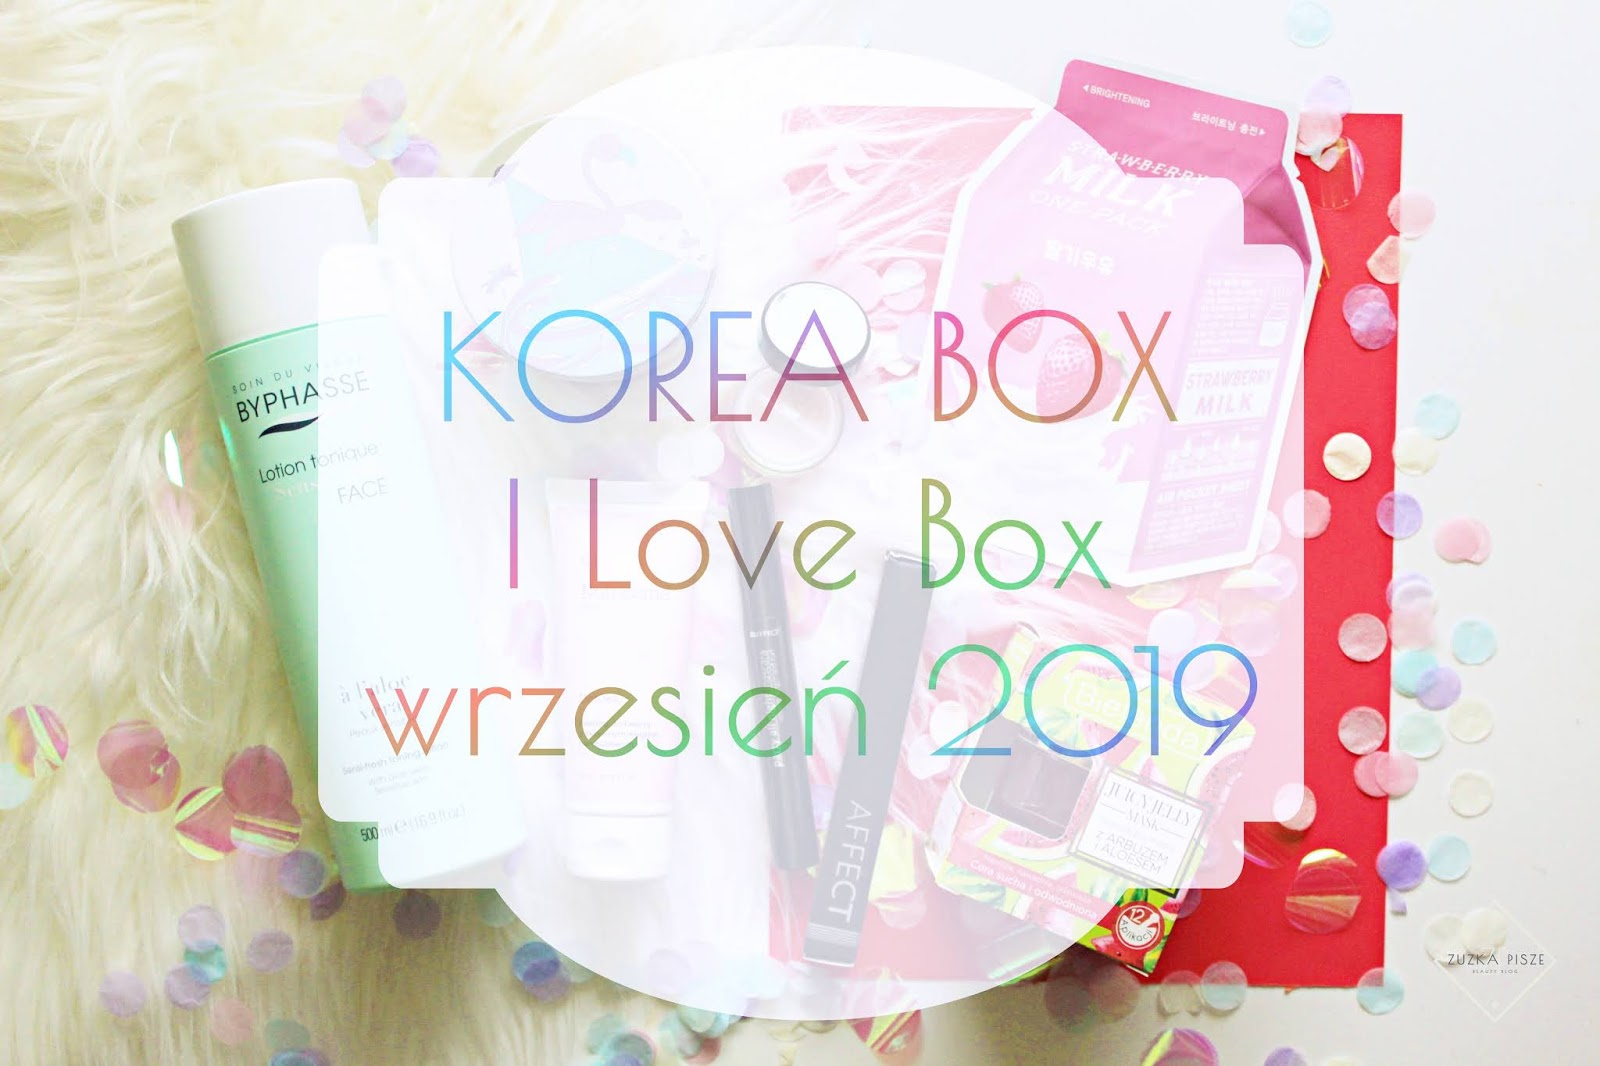 KOREA BOX - I Love Box - wrzesień 2019 - unboxing